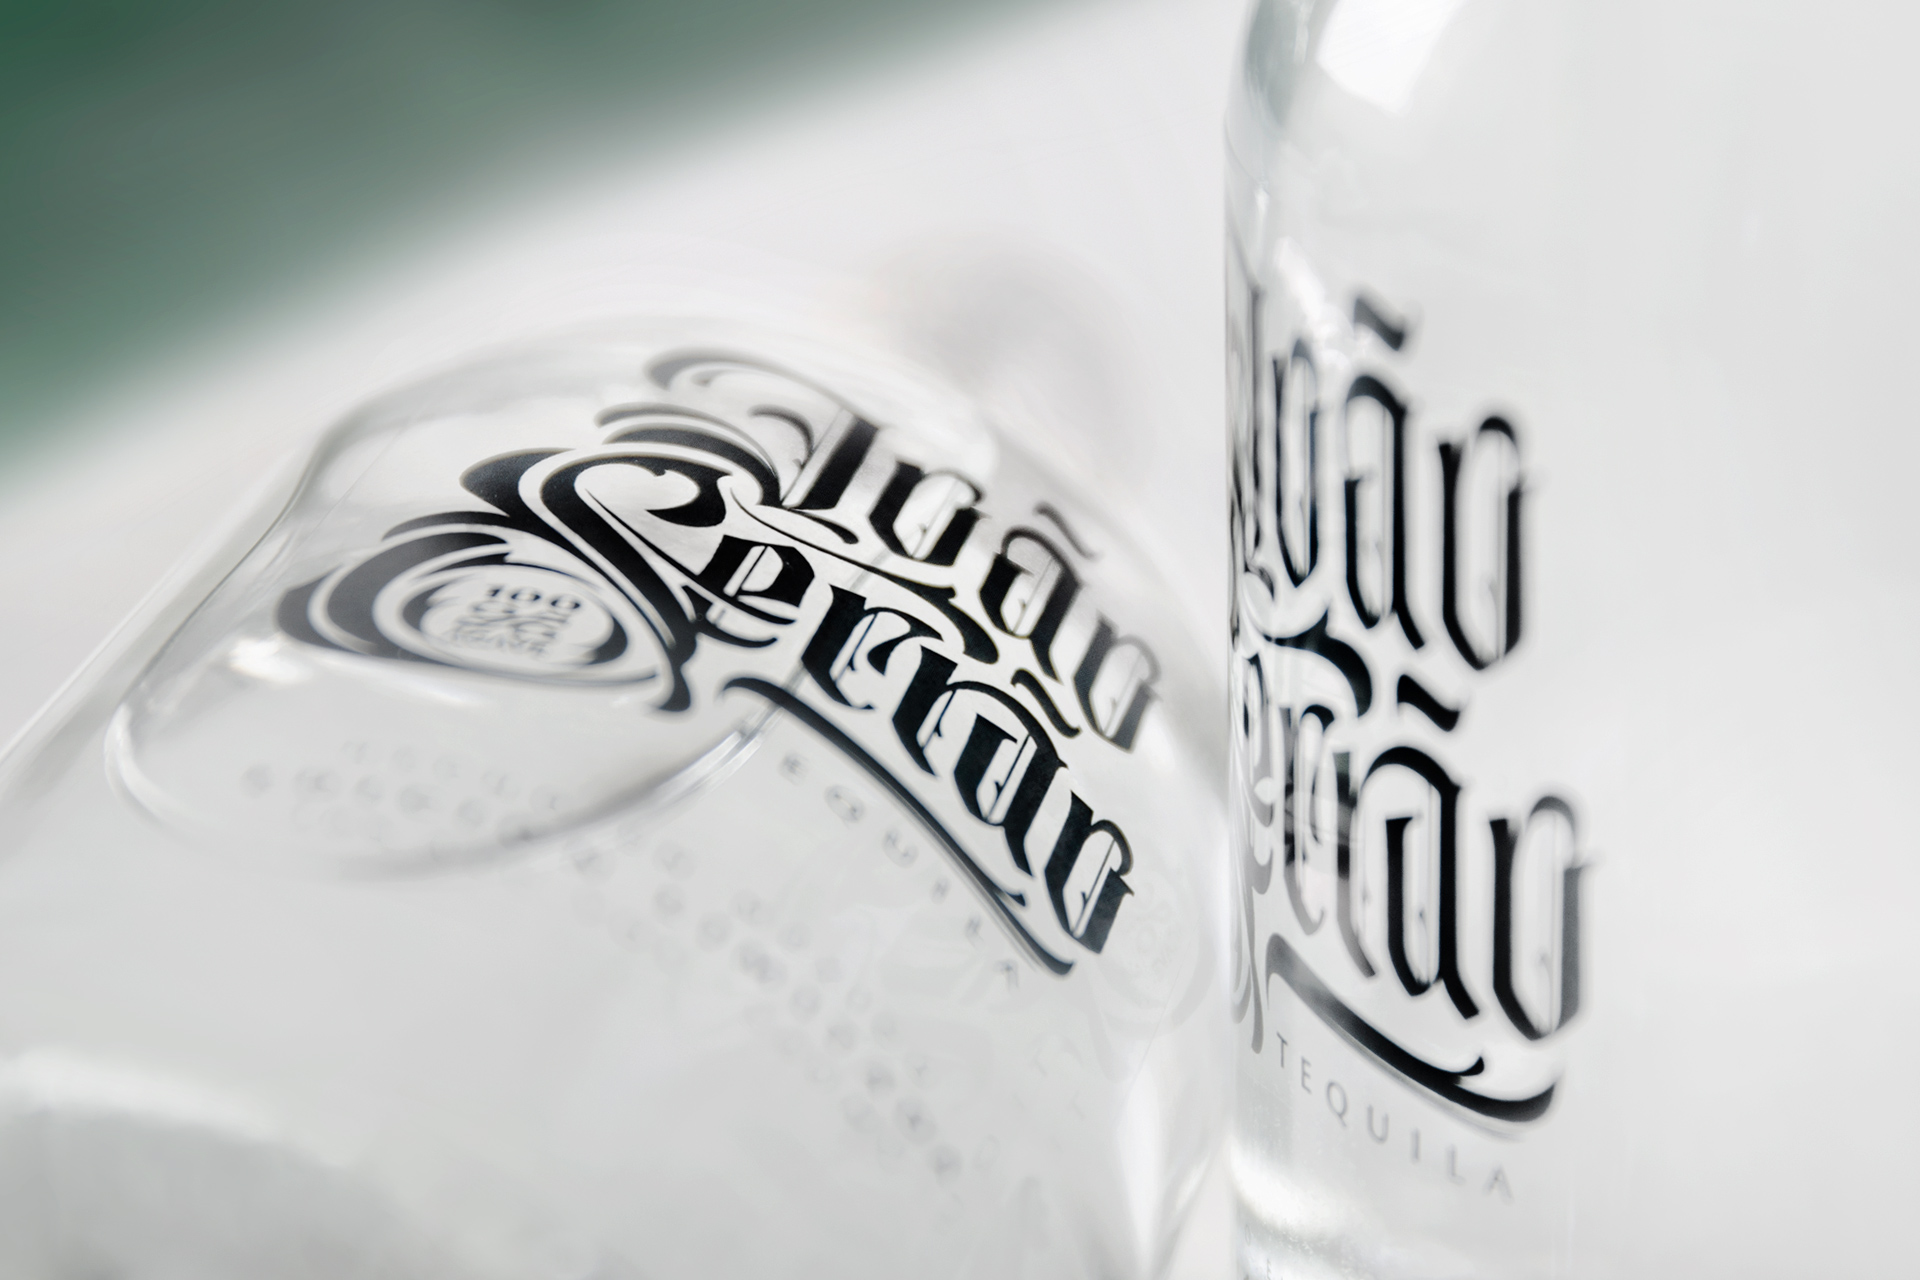 Joao Serrao Bottles